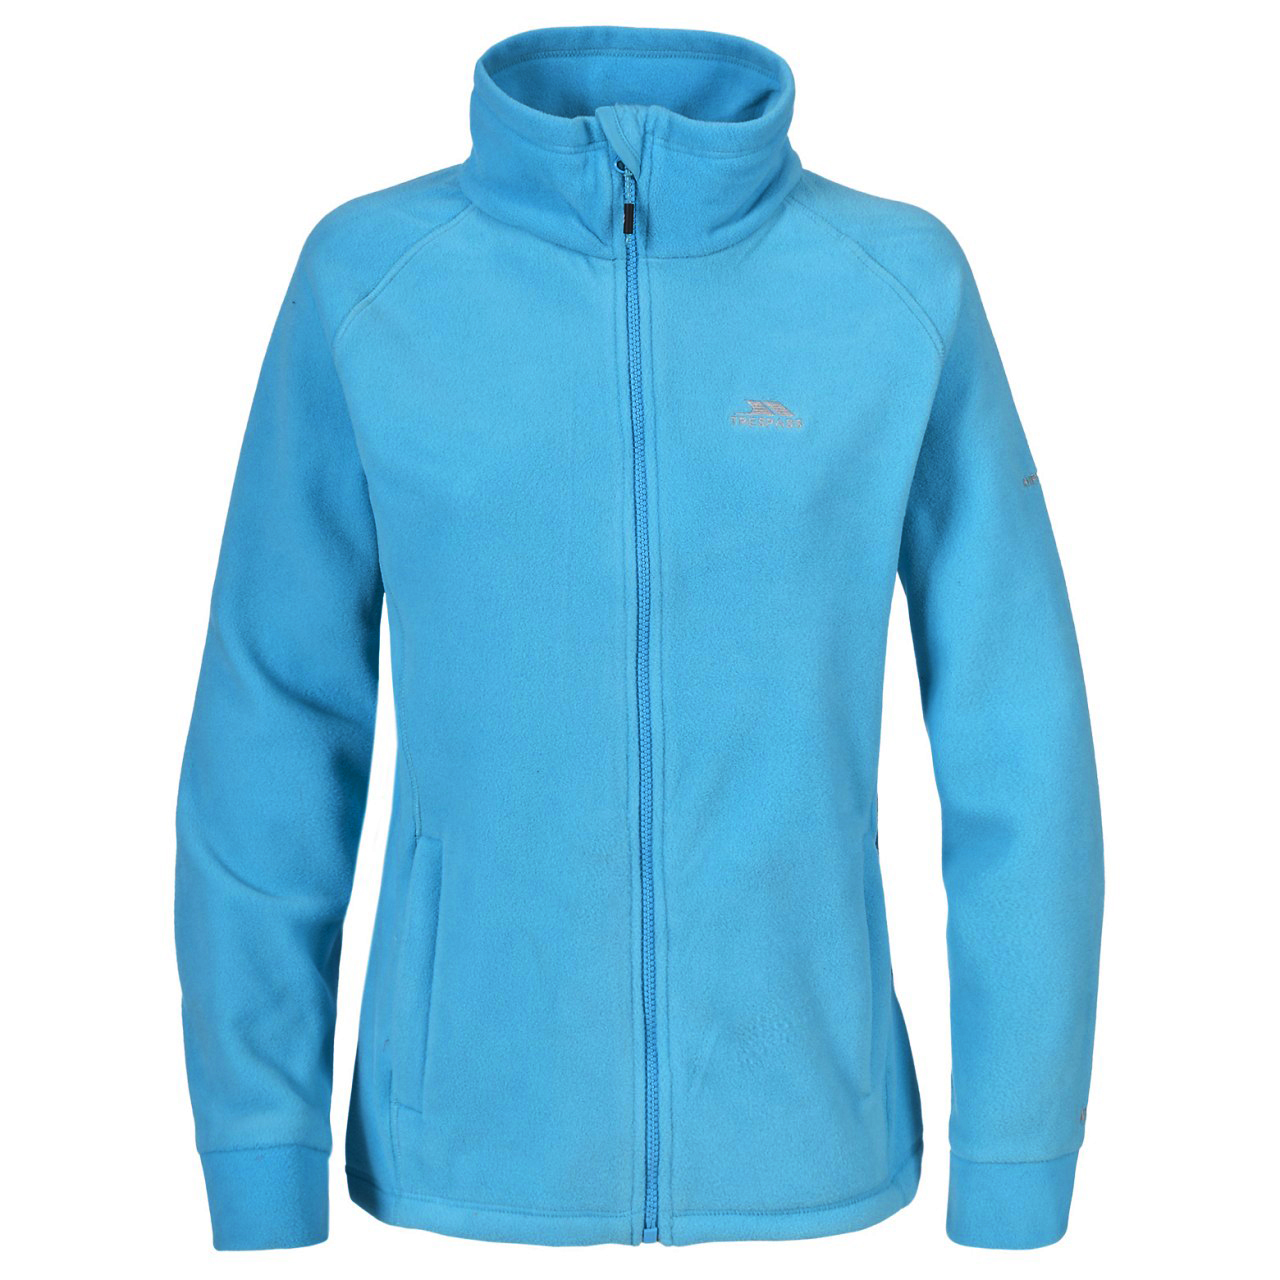 Trespass Womens/Ladies Clarice Full Zip Fleece Jacket (XL) (Cerise)